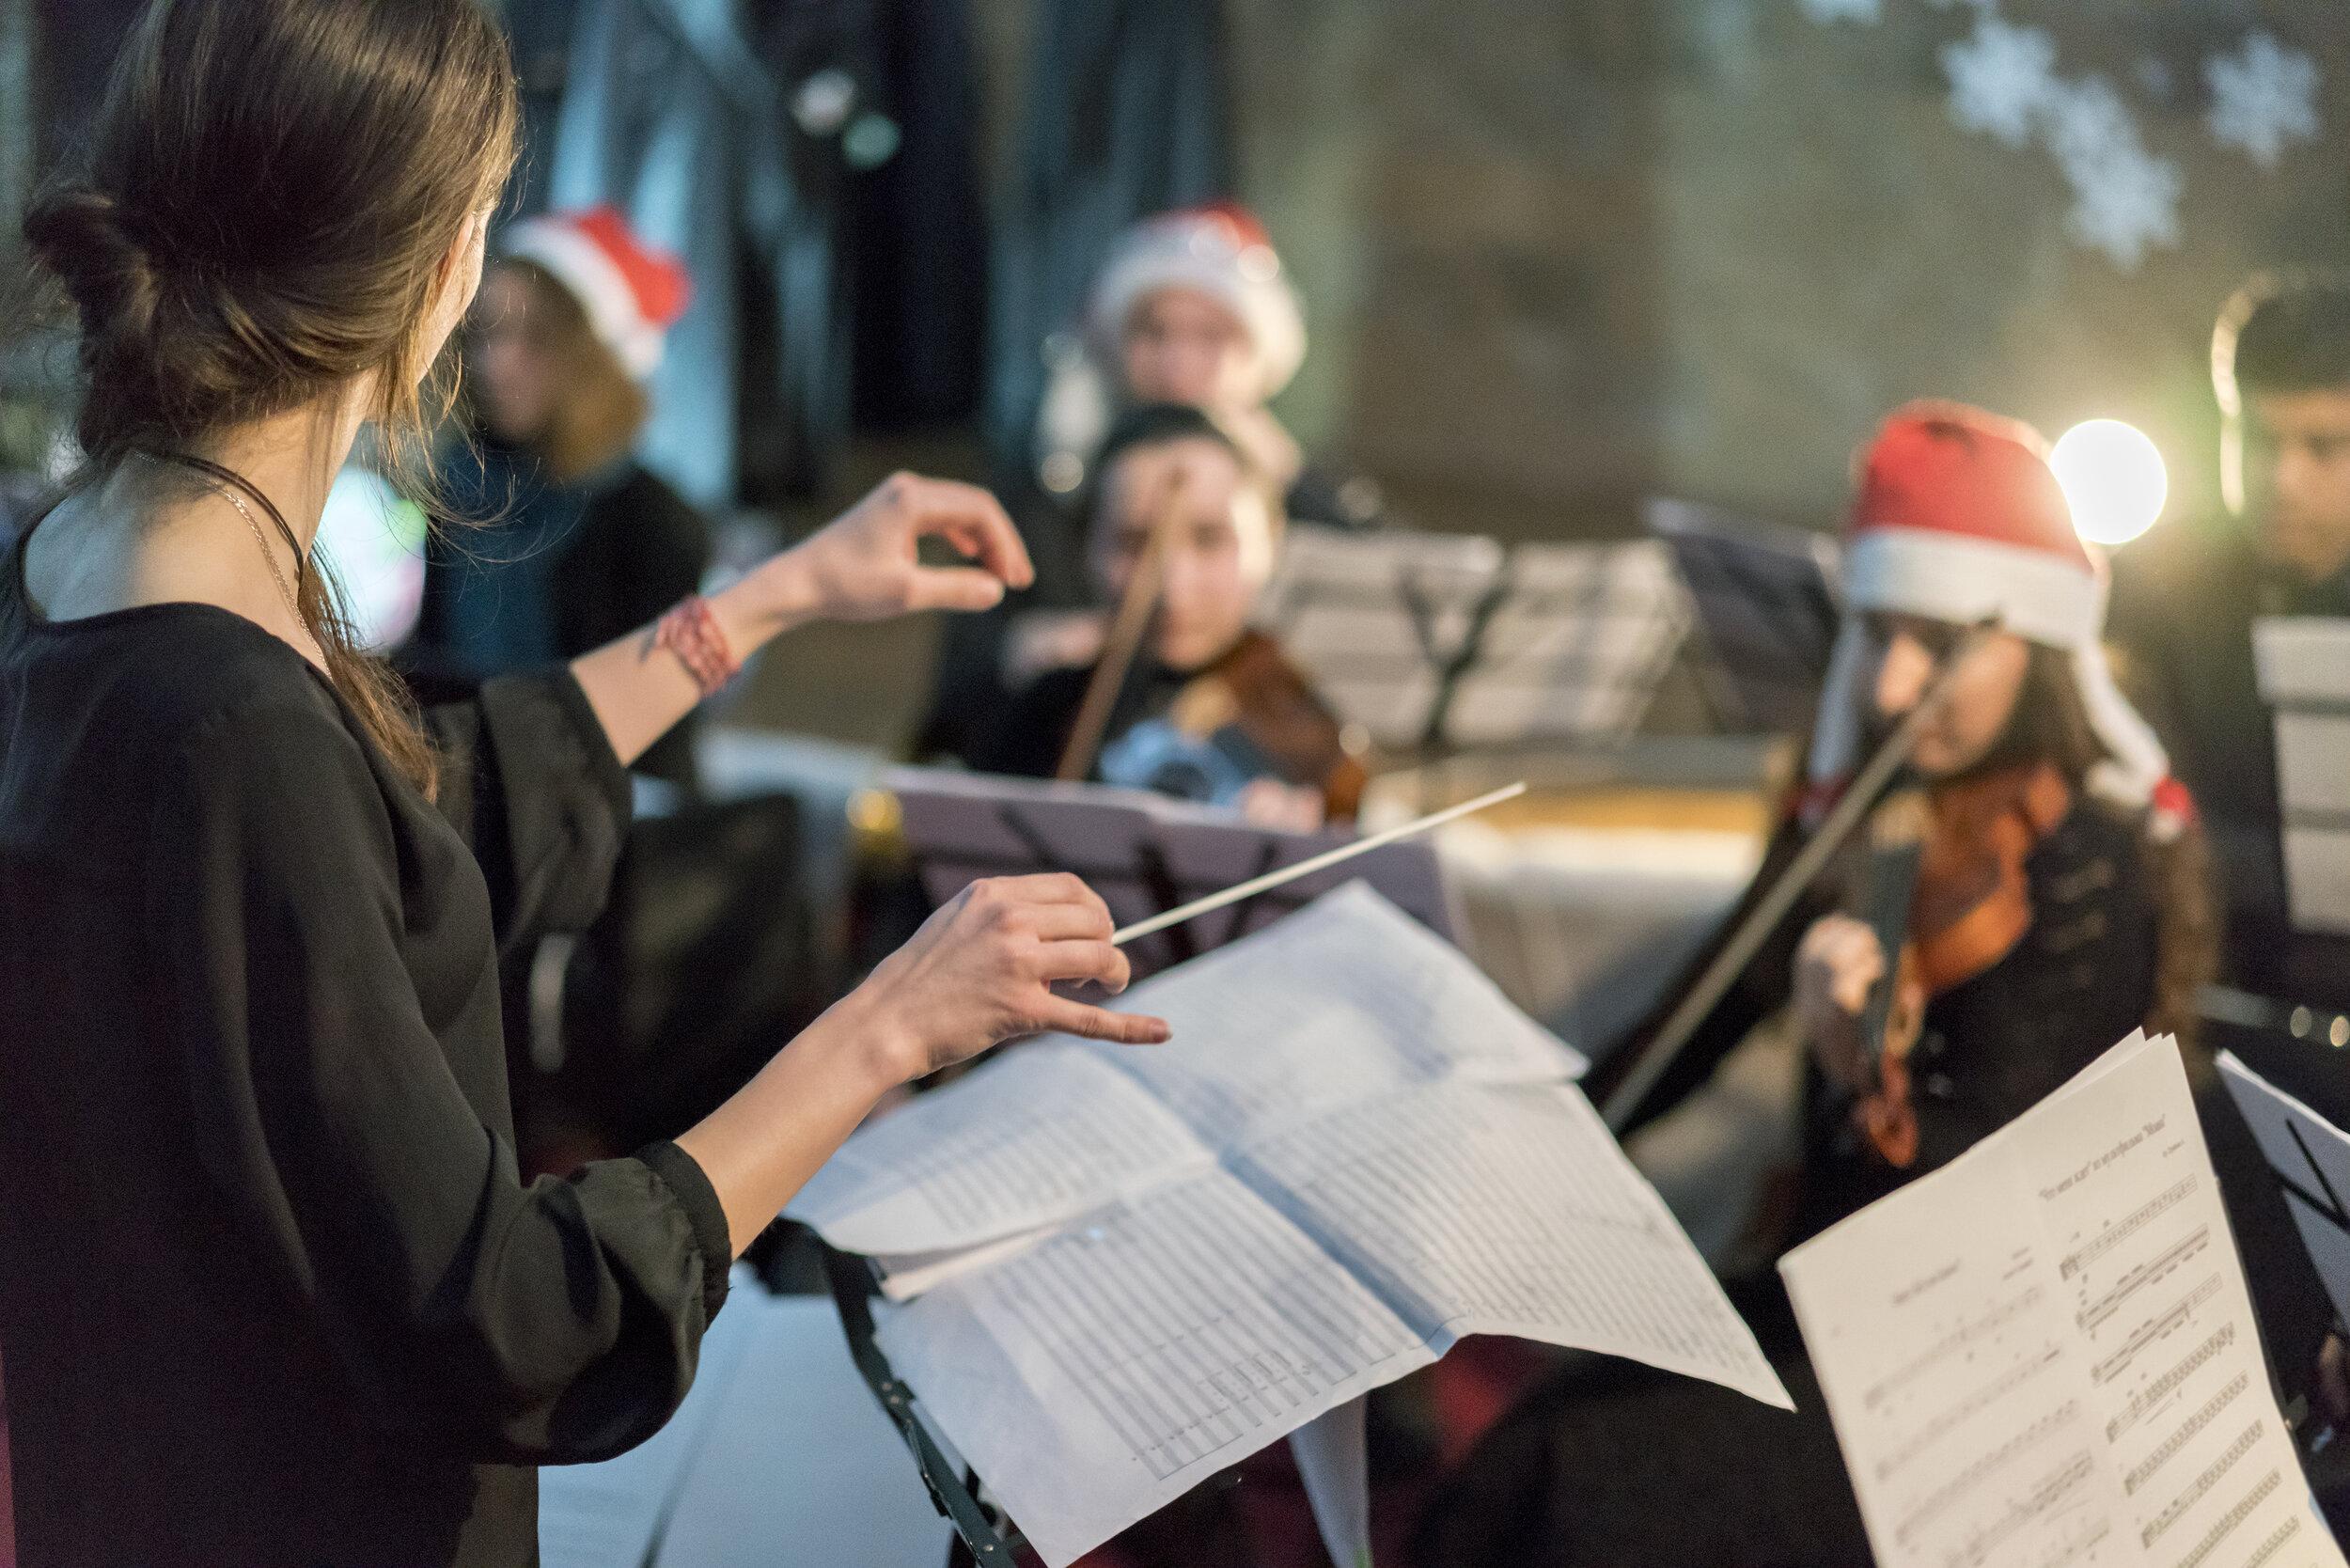 Classical string orchestra wearing Santa hats